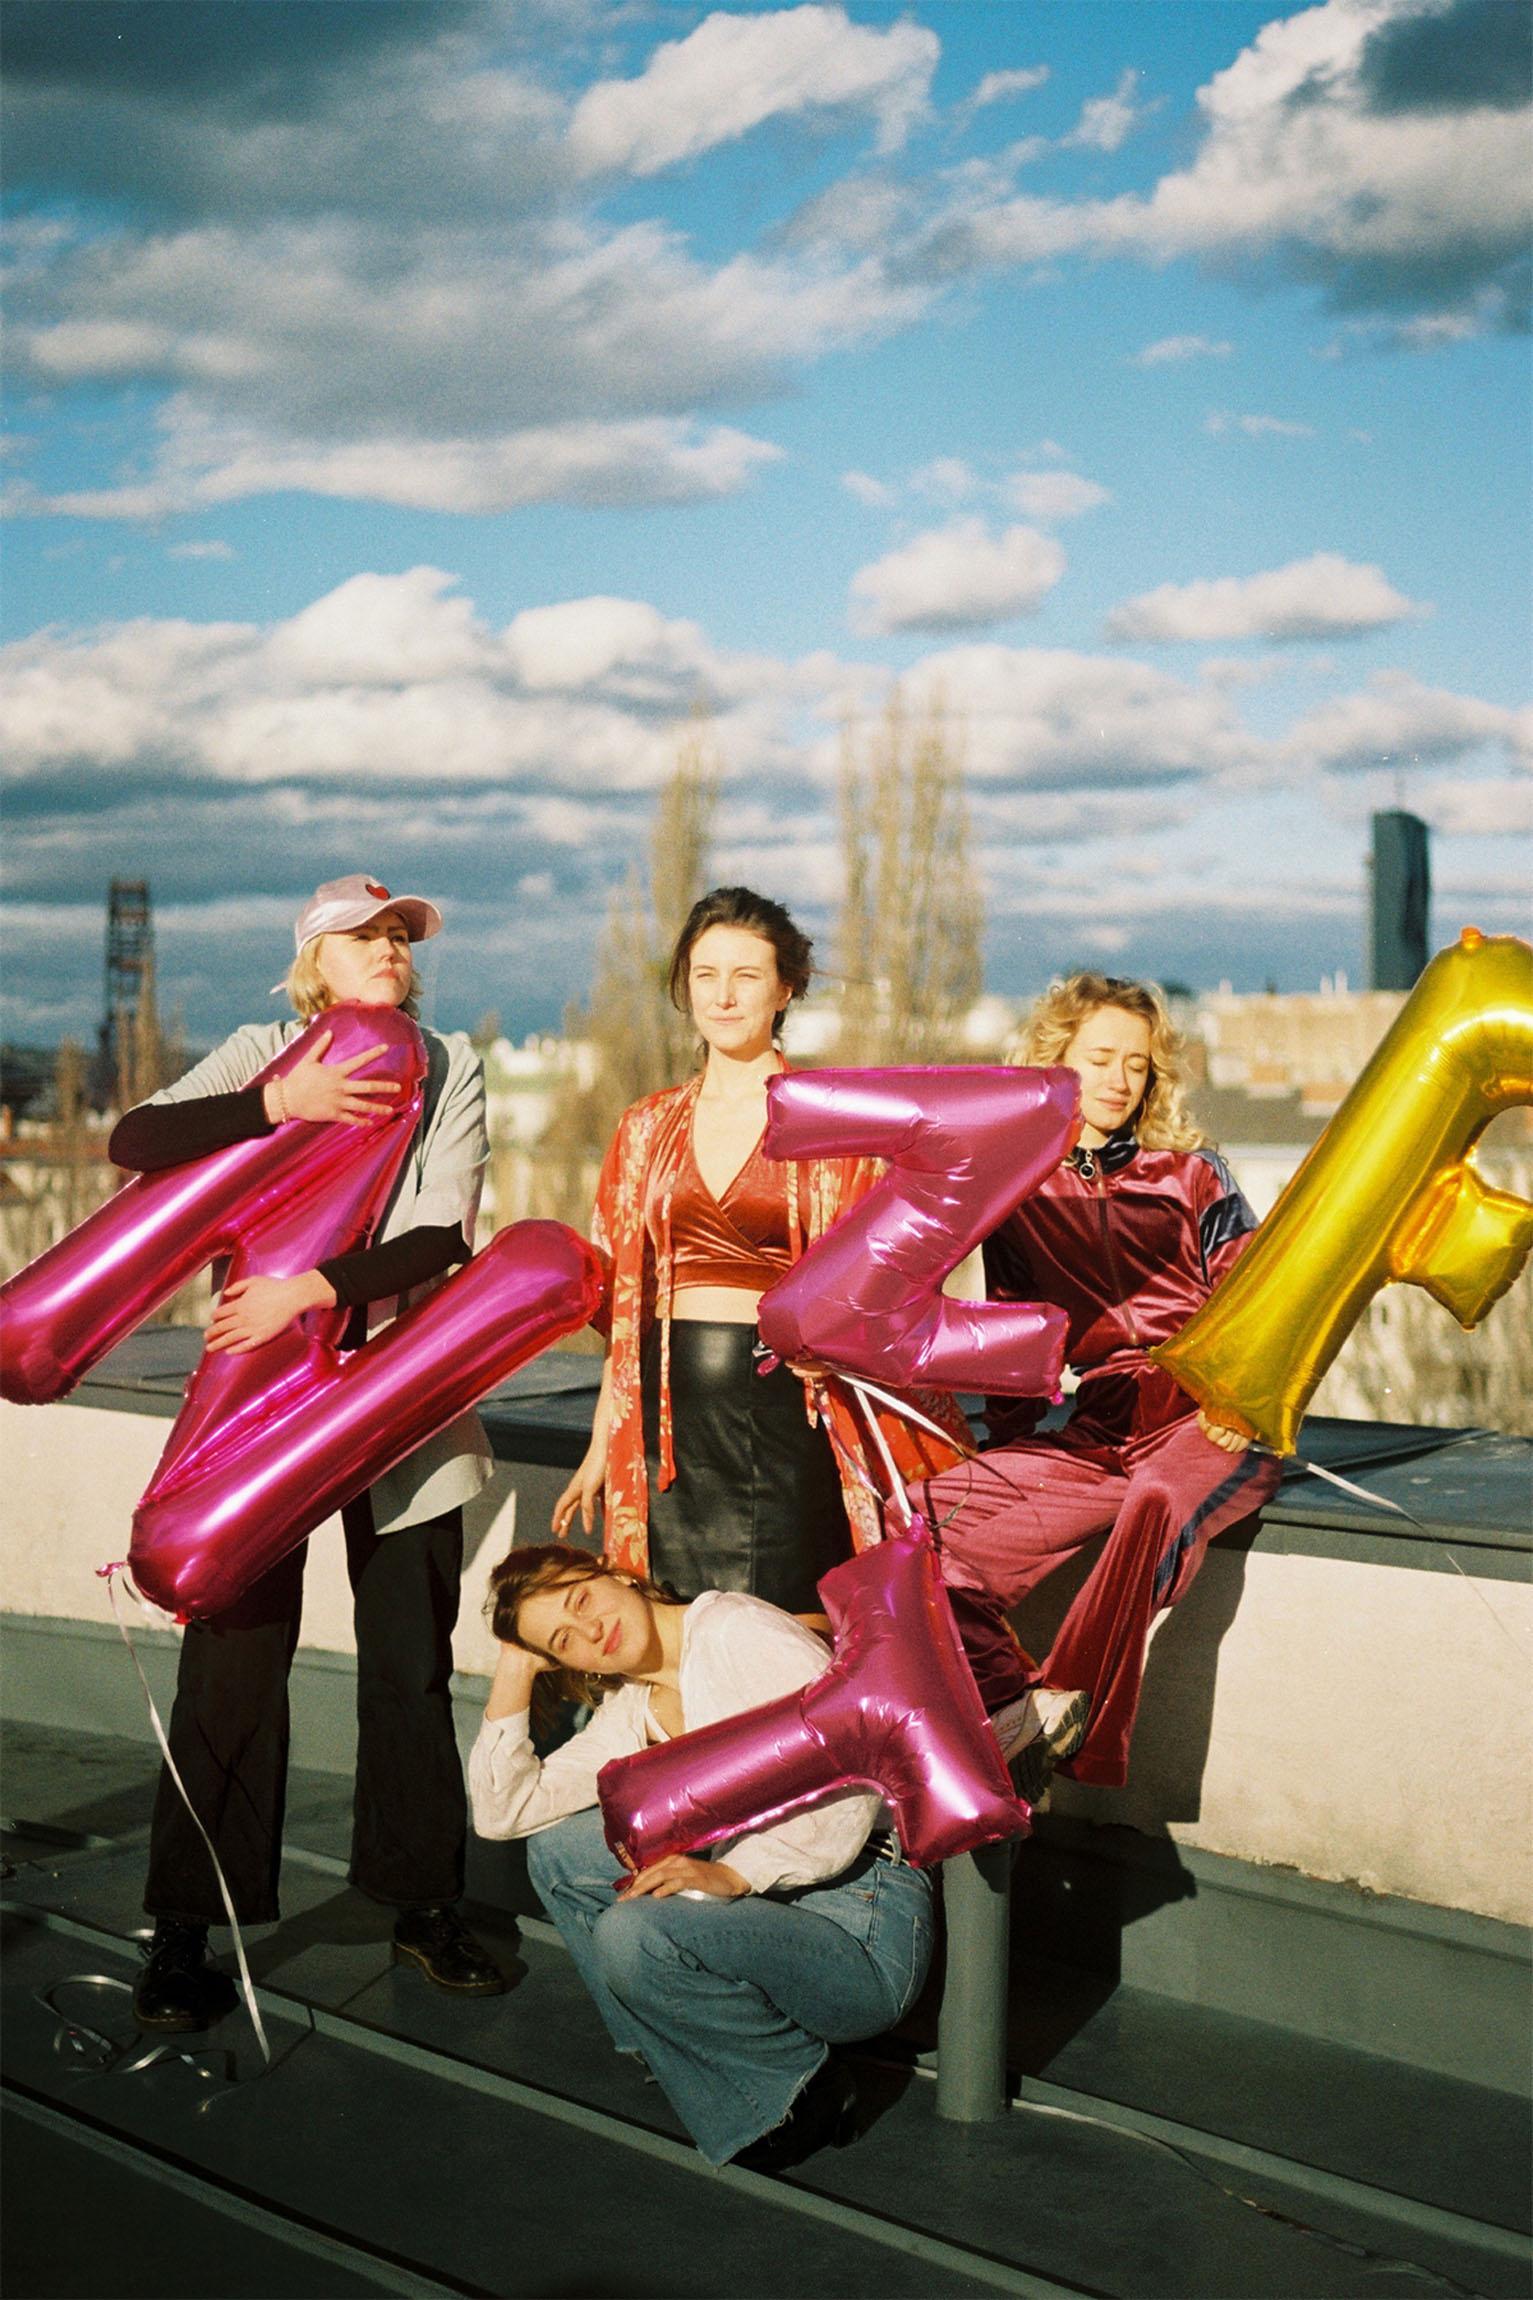 Vier Frauen, Luftballons